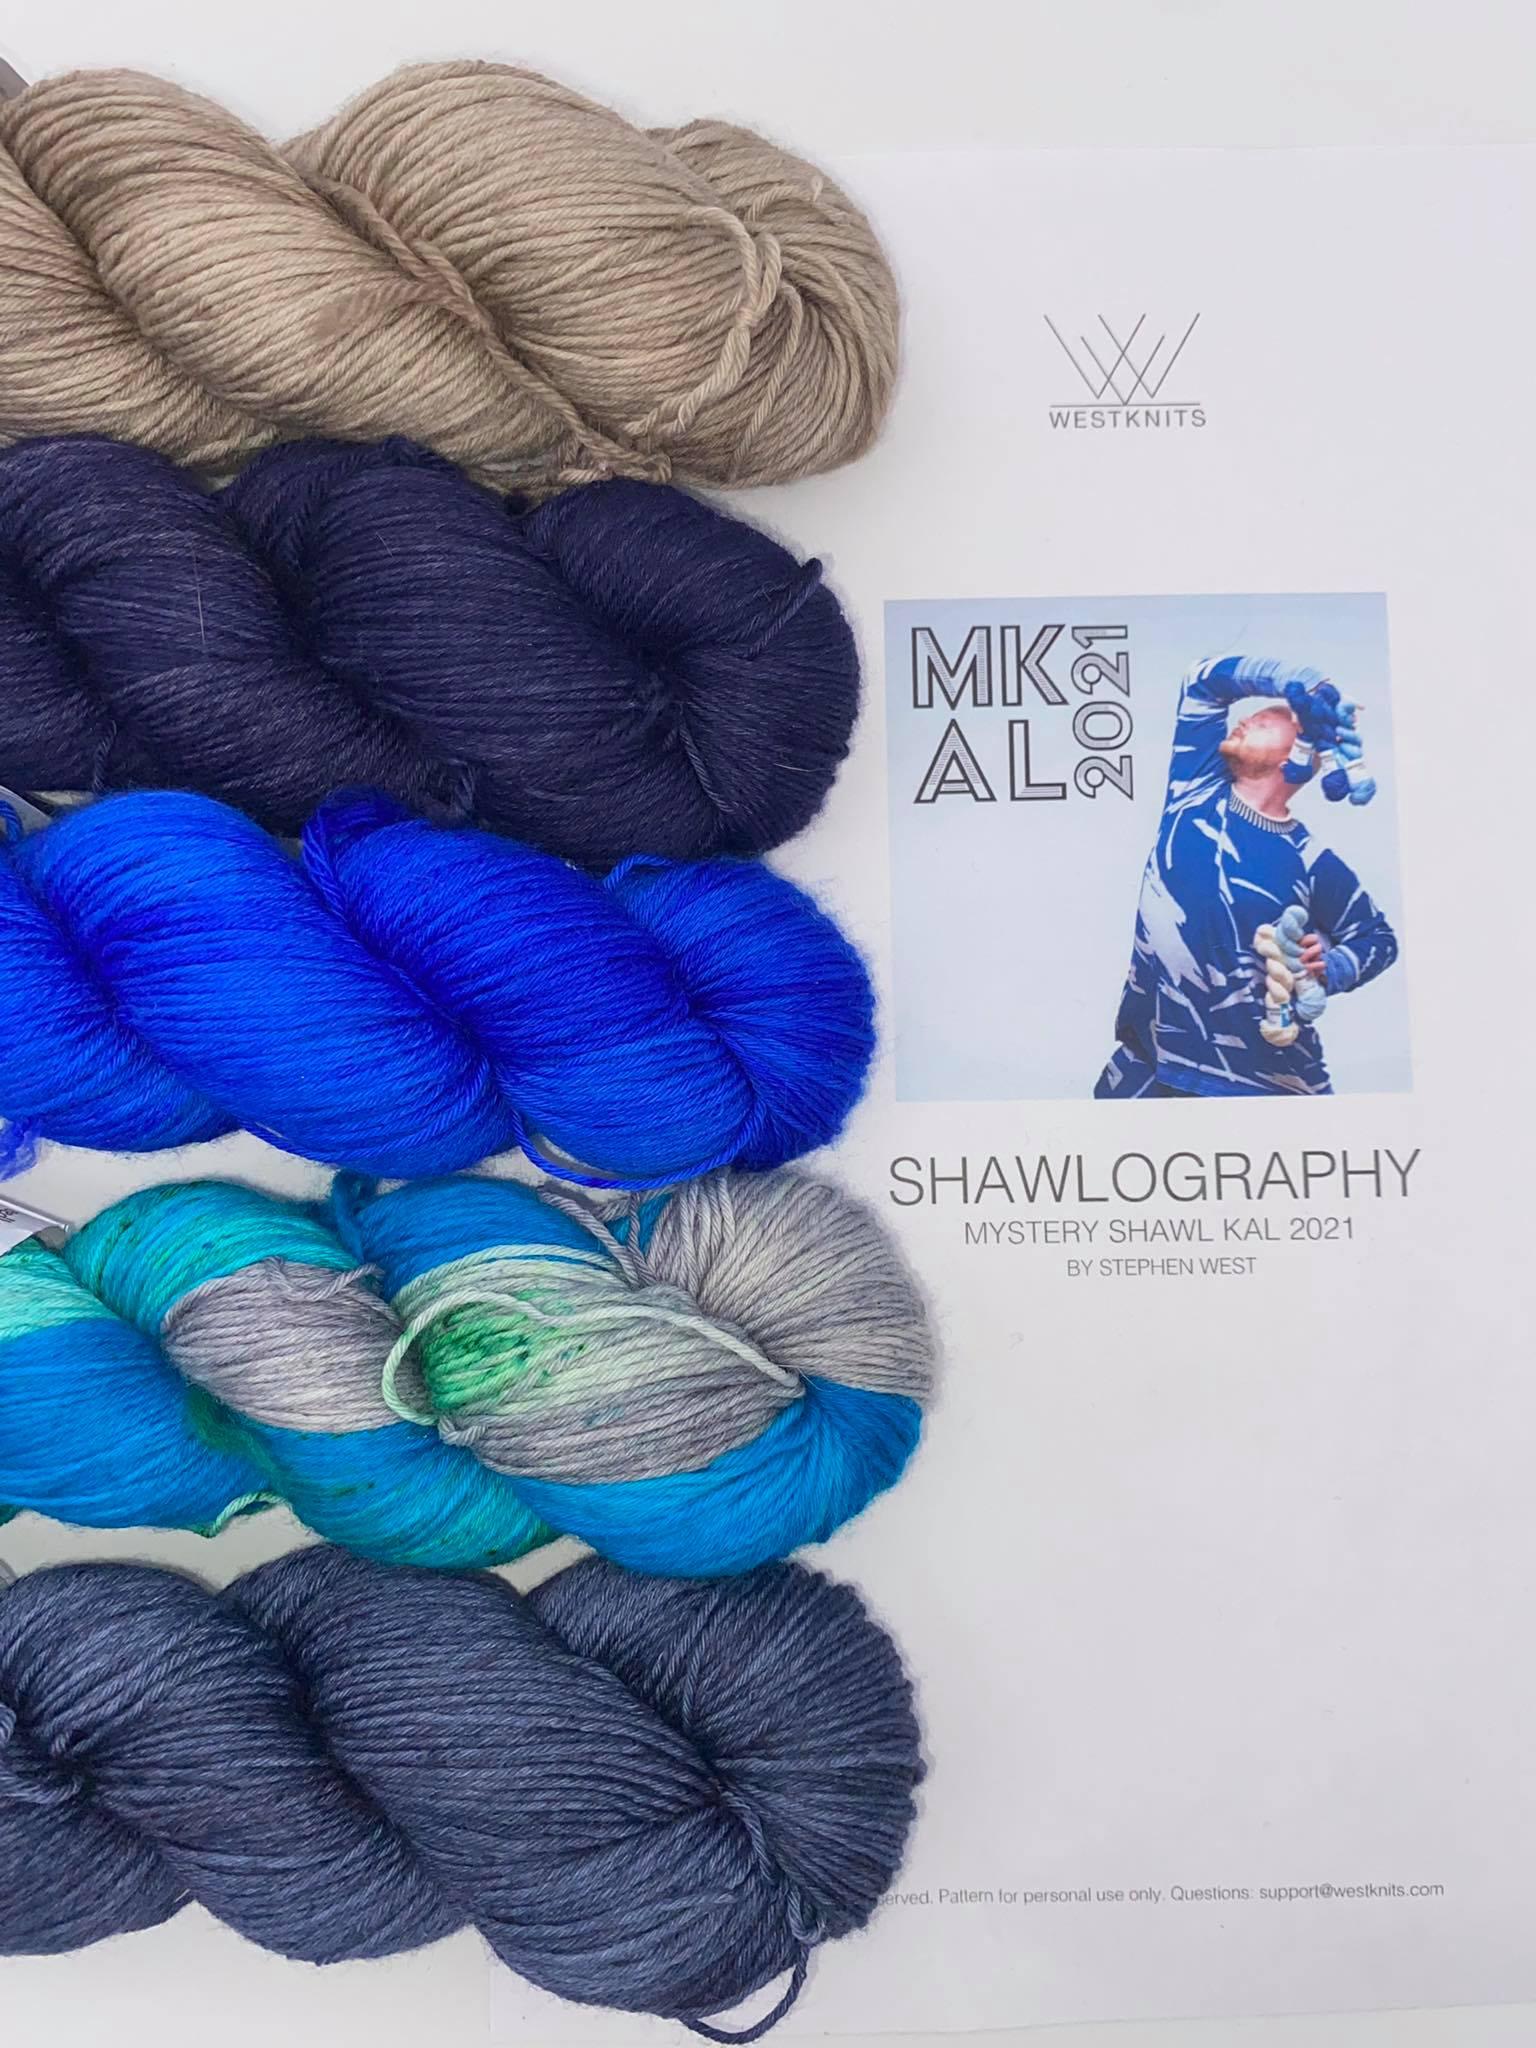 Woll Set Stephen West MKAL Shawlography #19